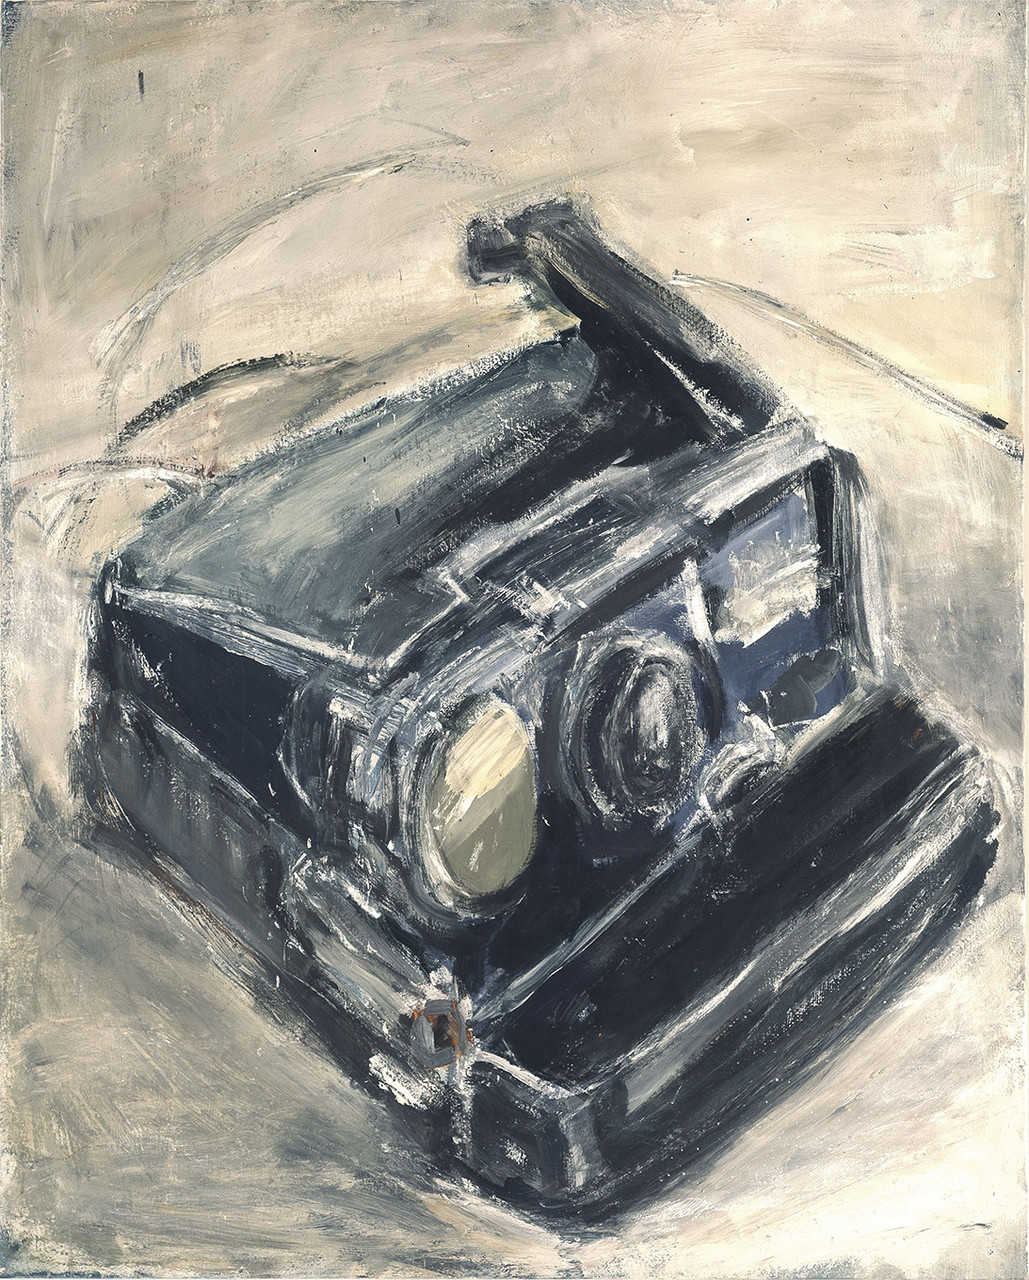 Polaroid 150 x 125 cm 1982